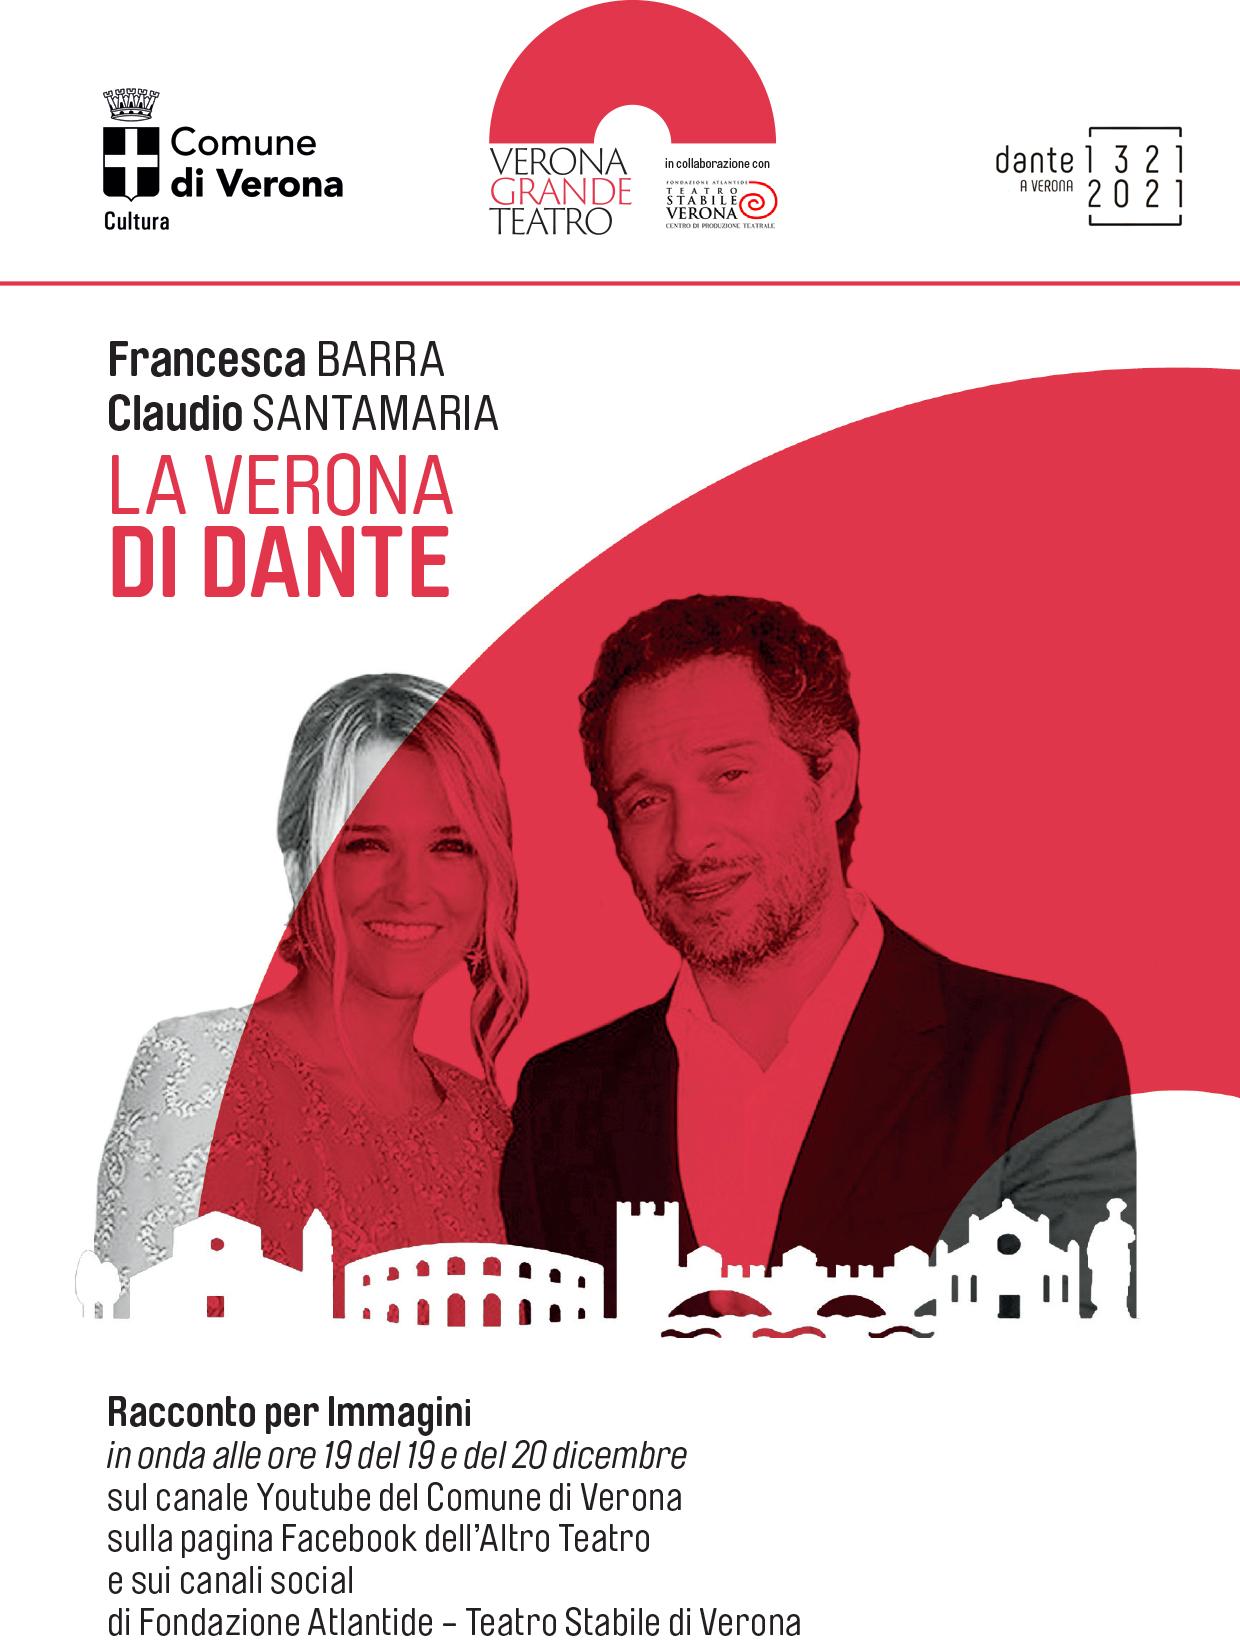 2020_12_23_Verona-di-Dante-1